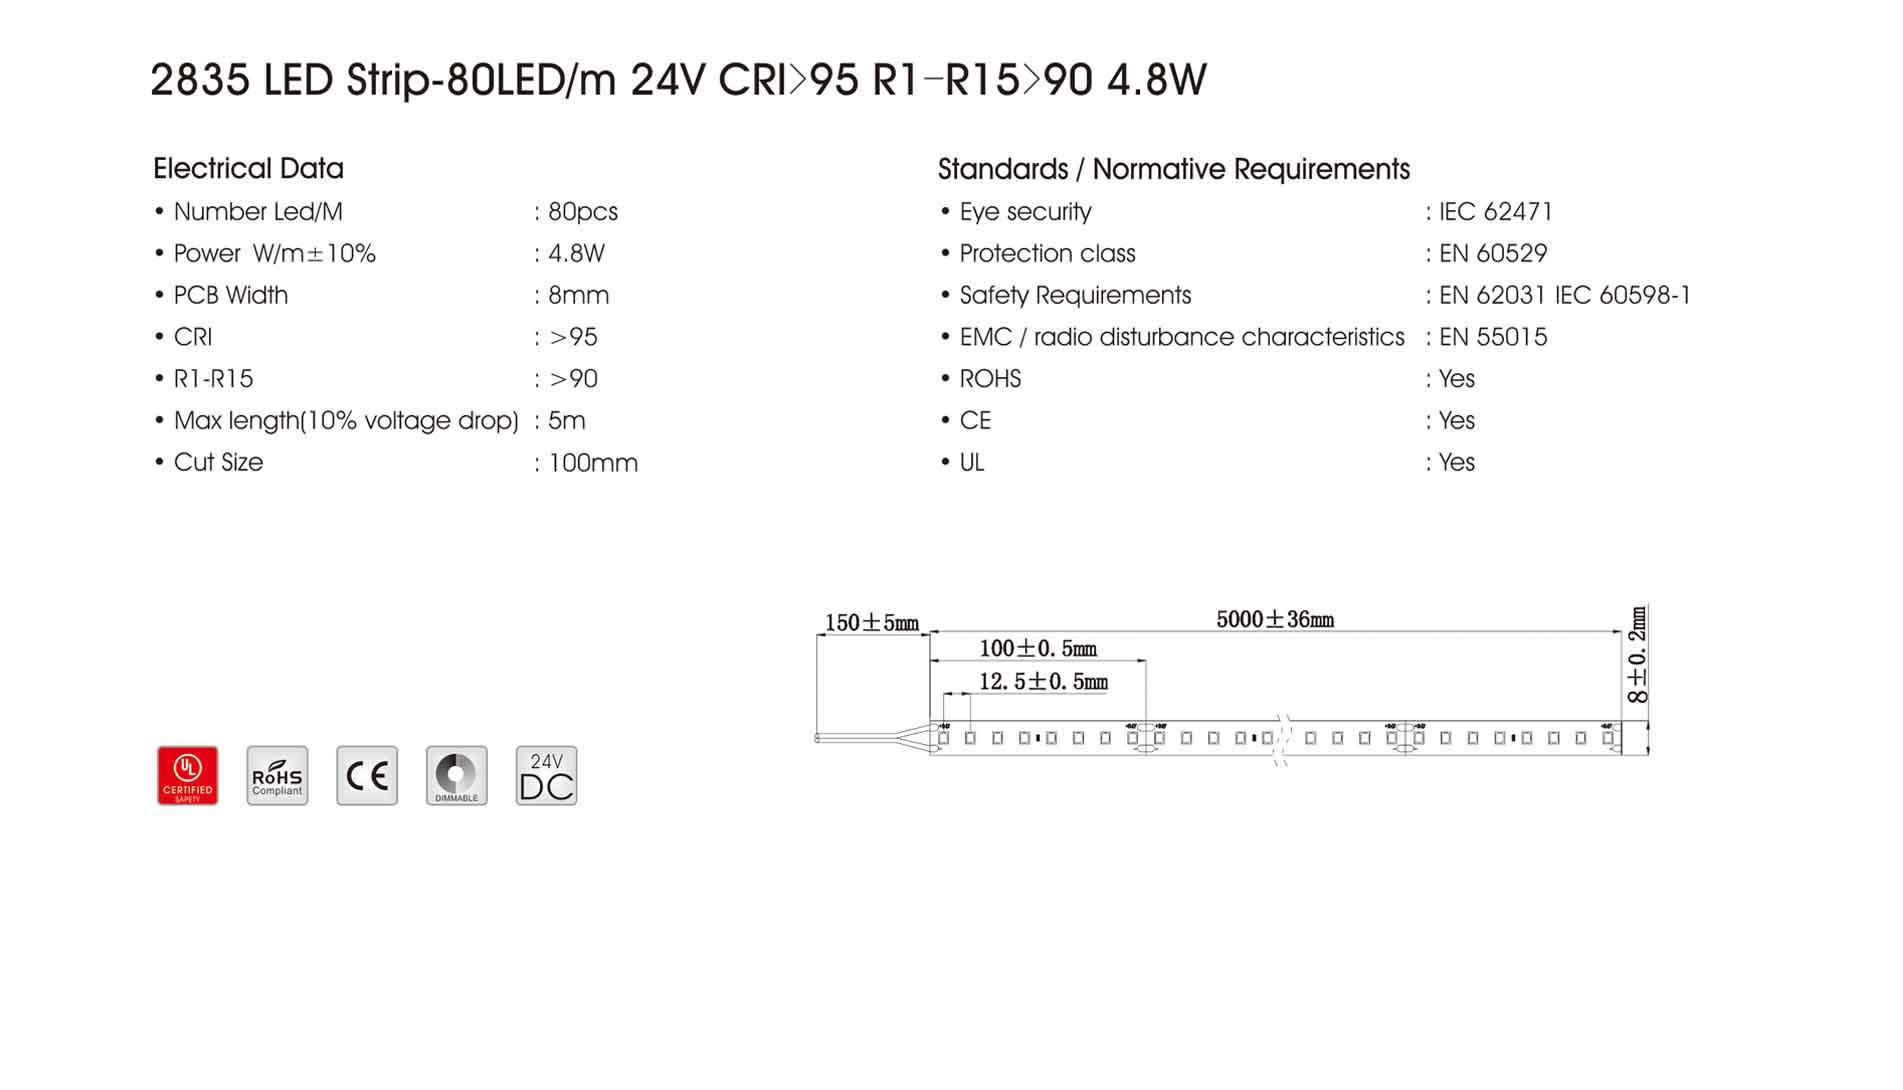 2835 led strip 80ledm 24v cri95 r1-r15>90 4.8w